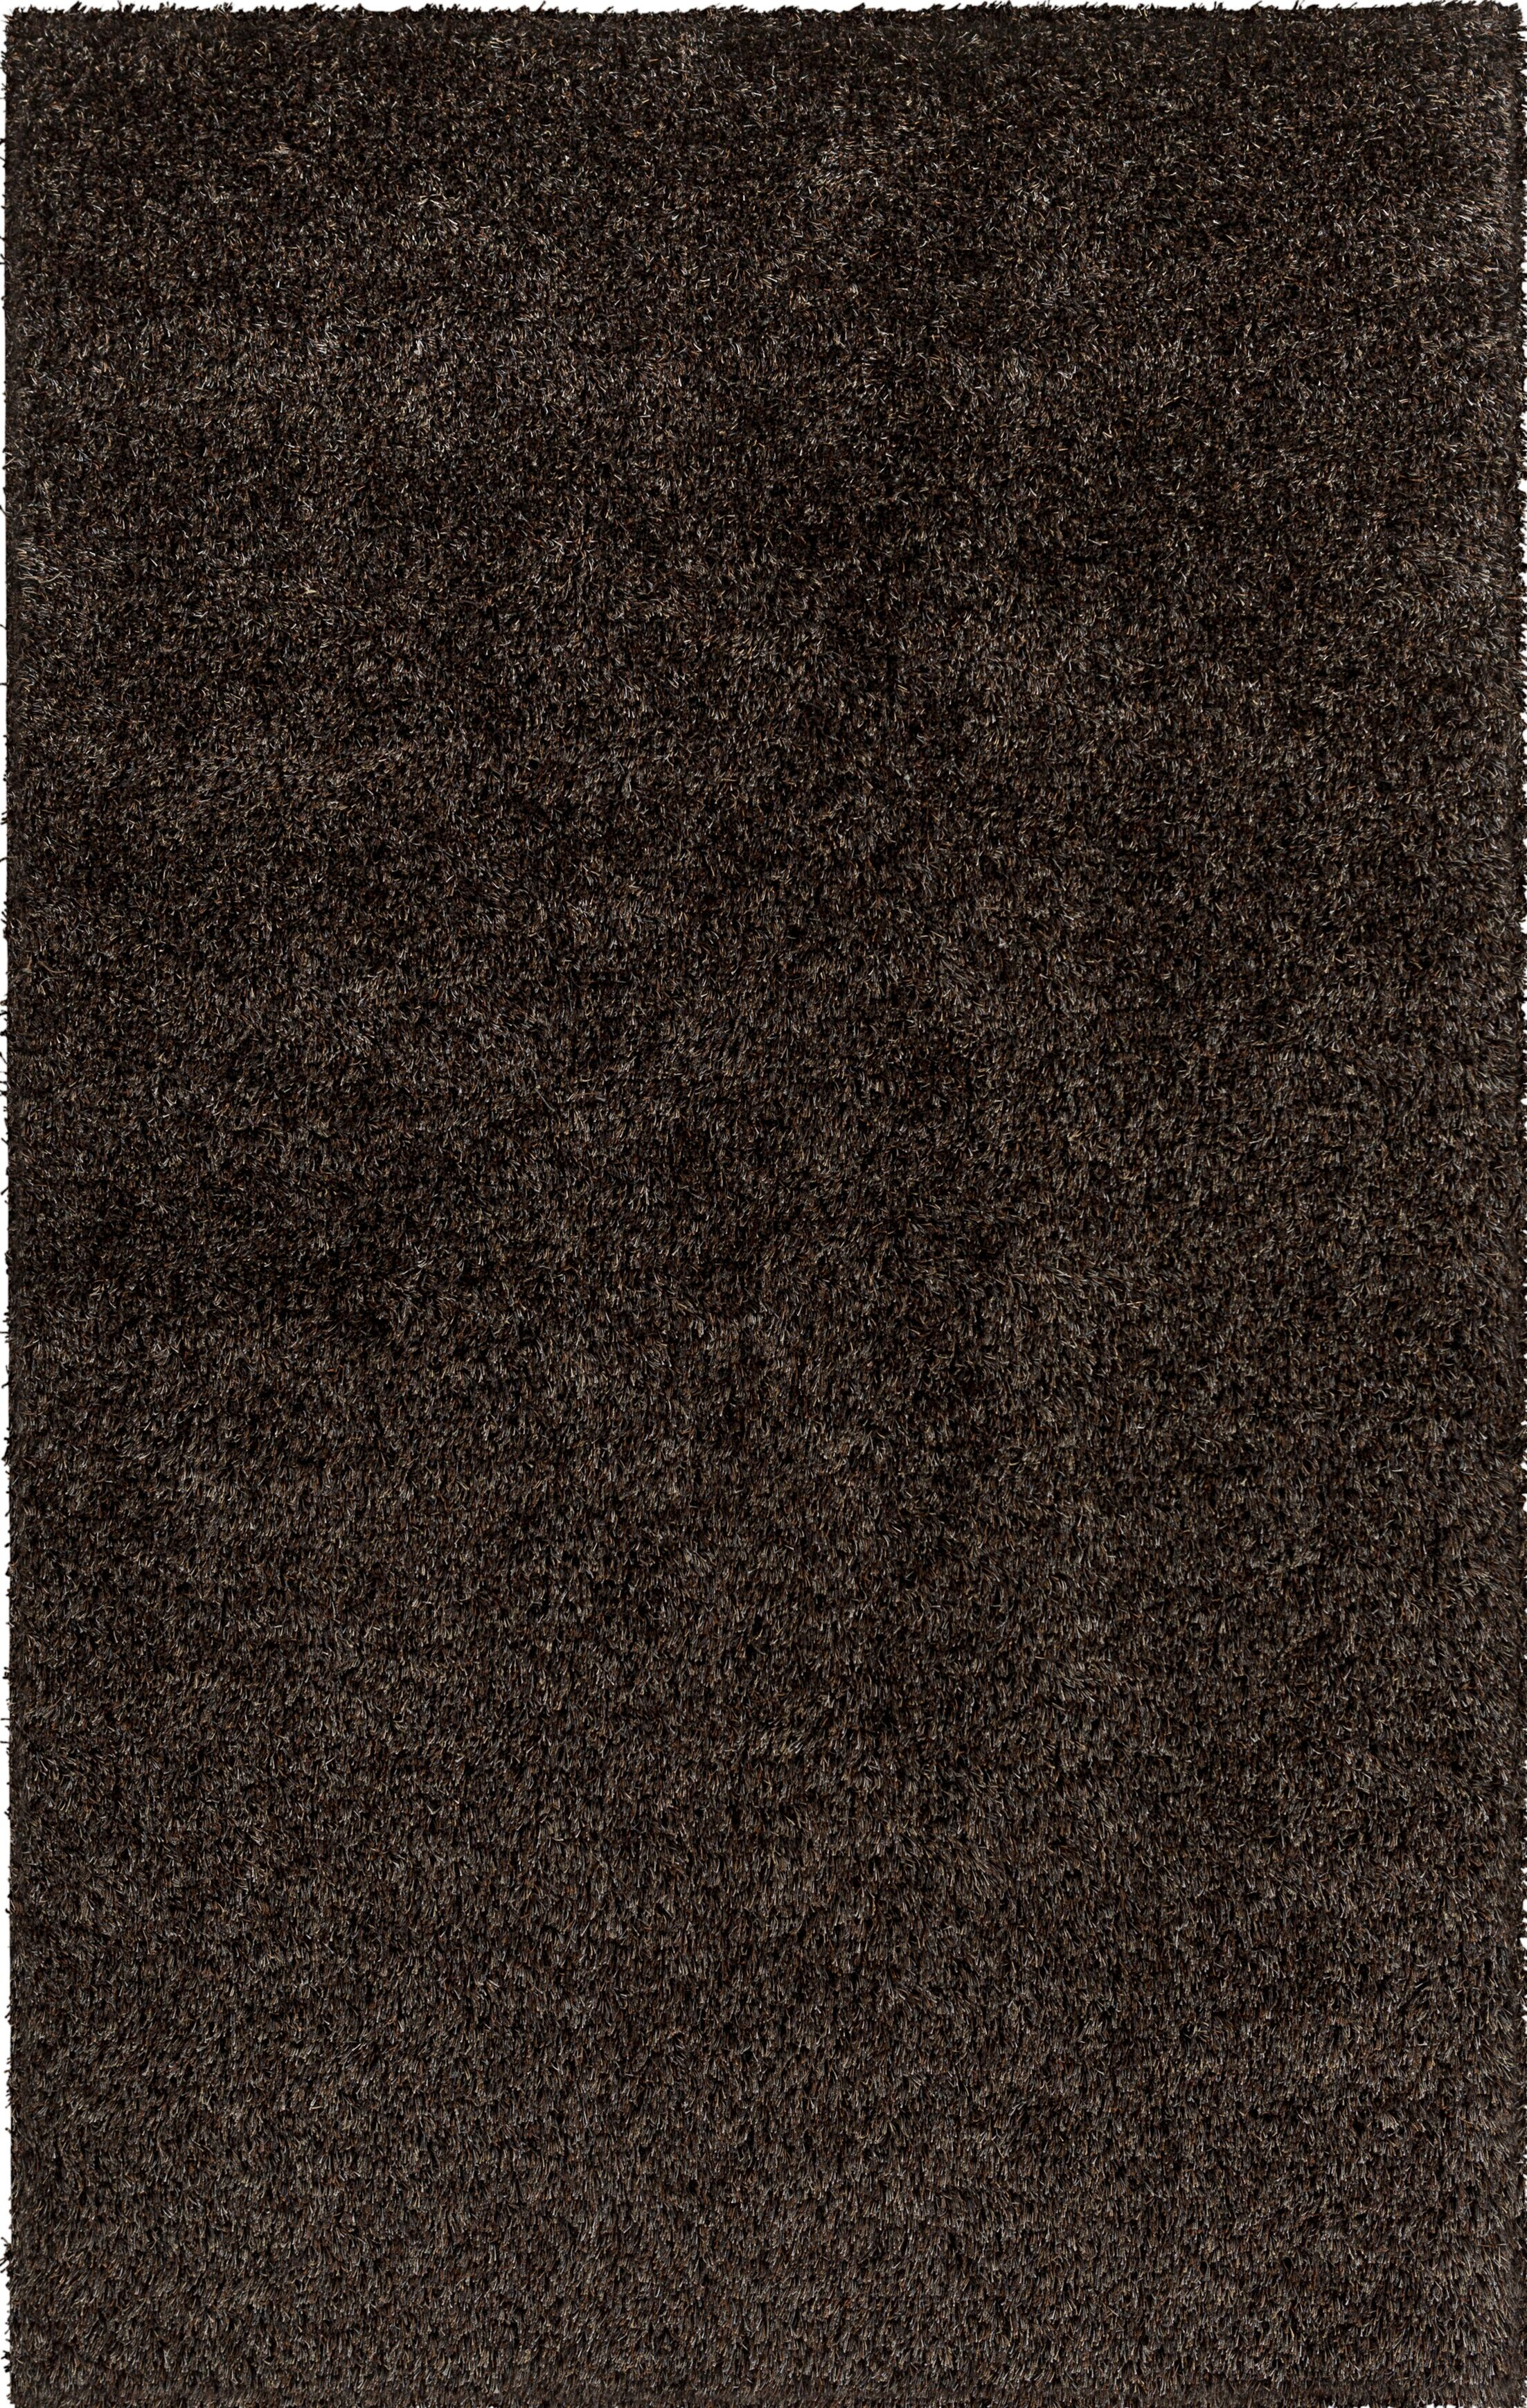 Birkholz Dark Brown Area Rug Rug Size: Rectangle 4' x 6'